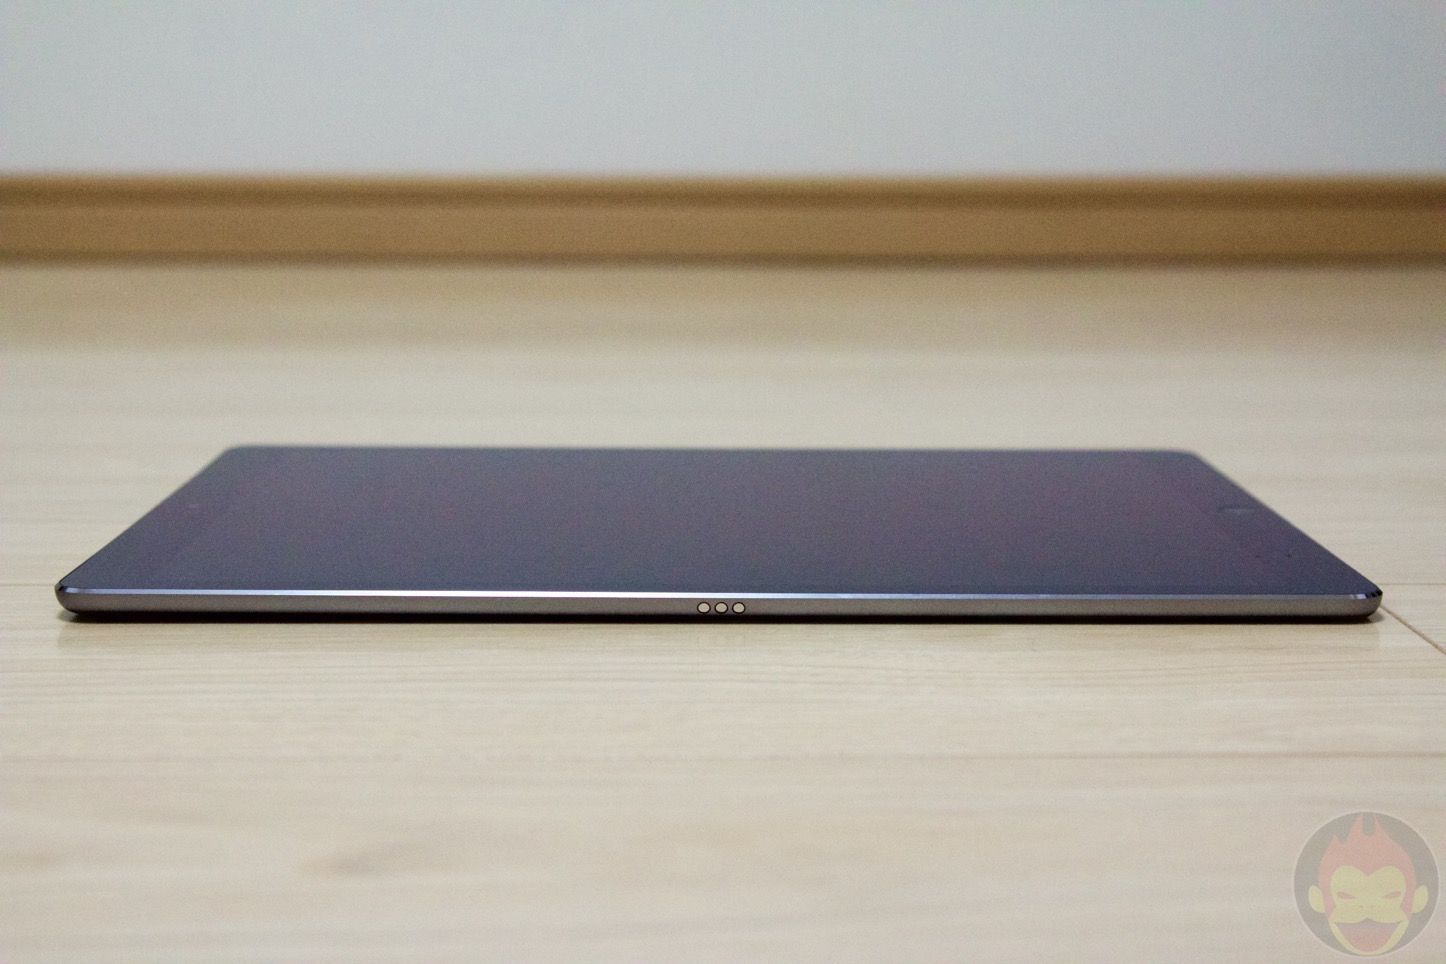 iPad-Pro-Unboxing-07.jpg